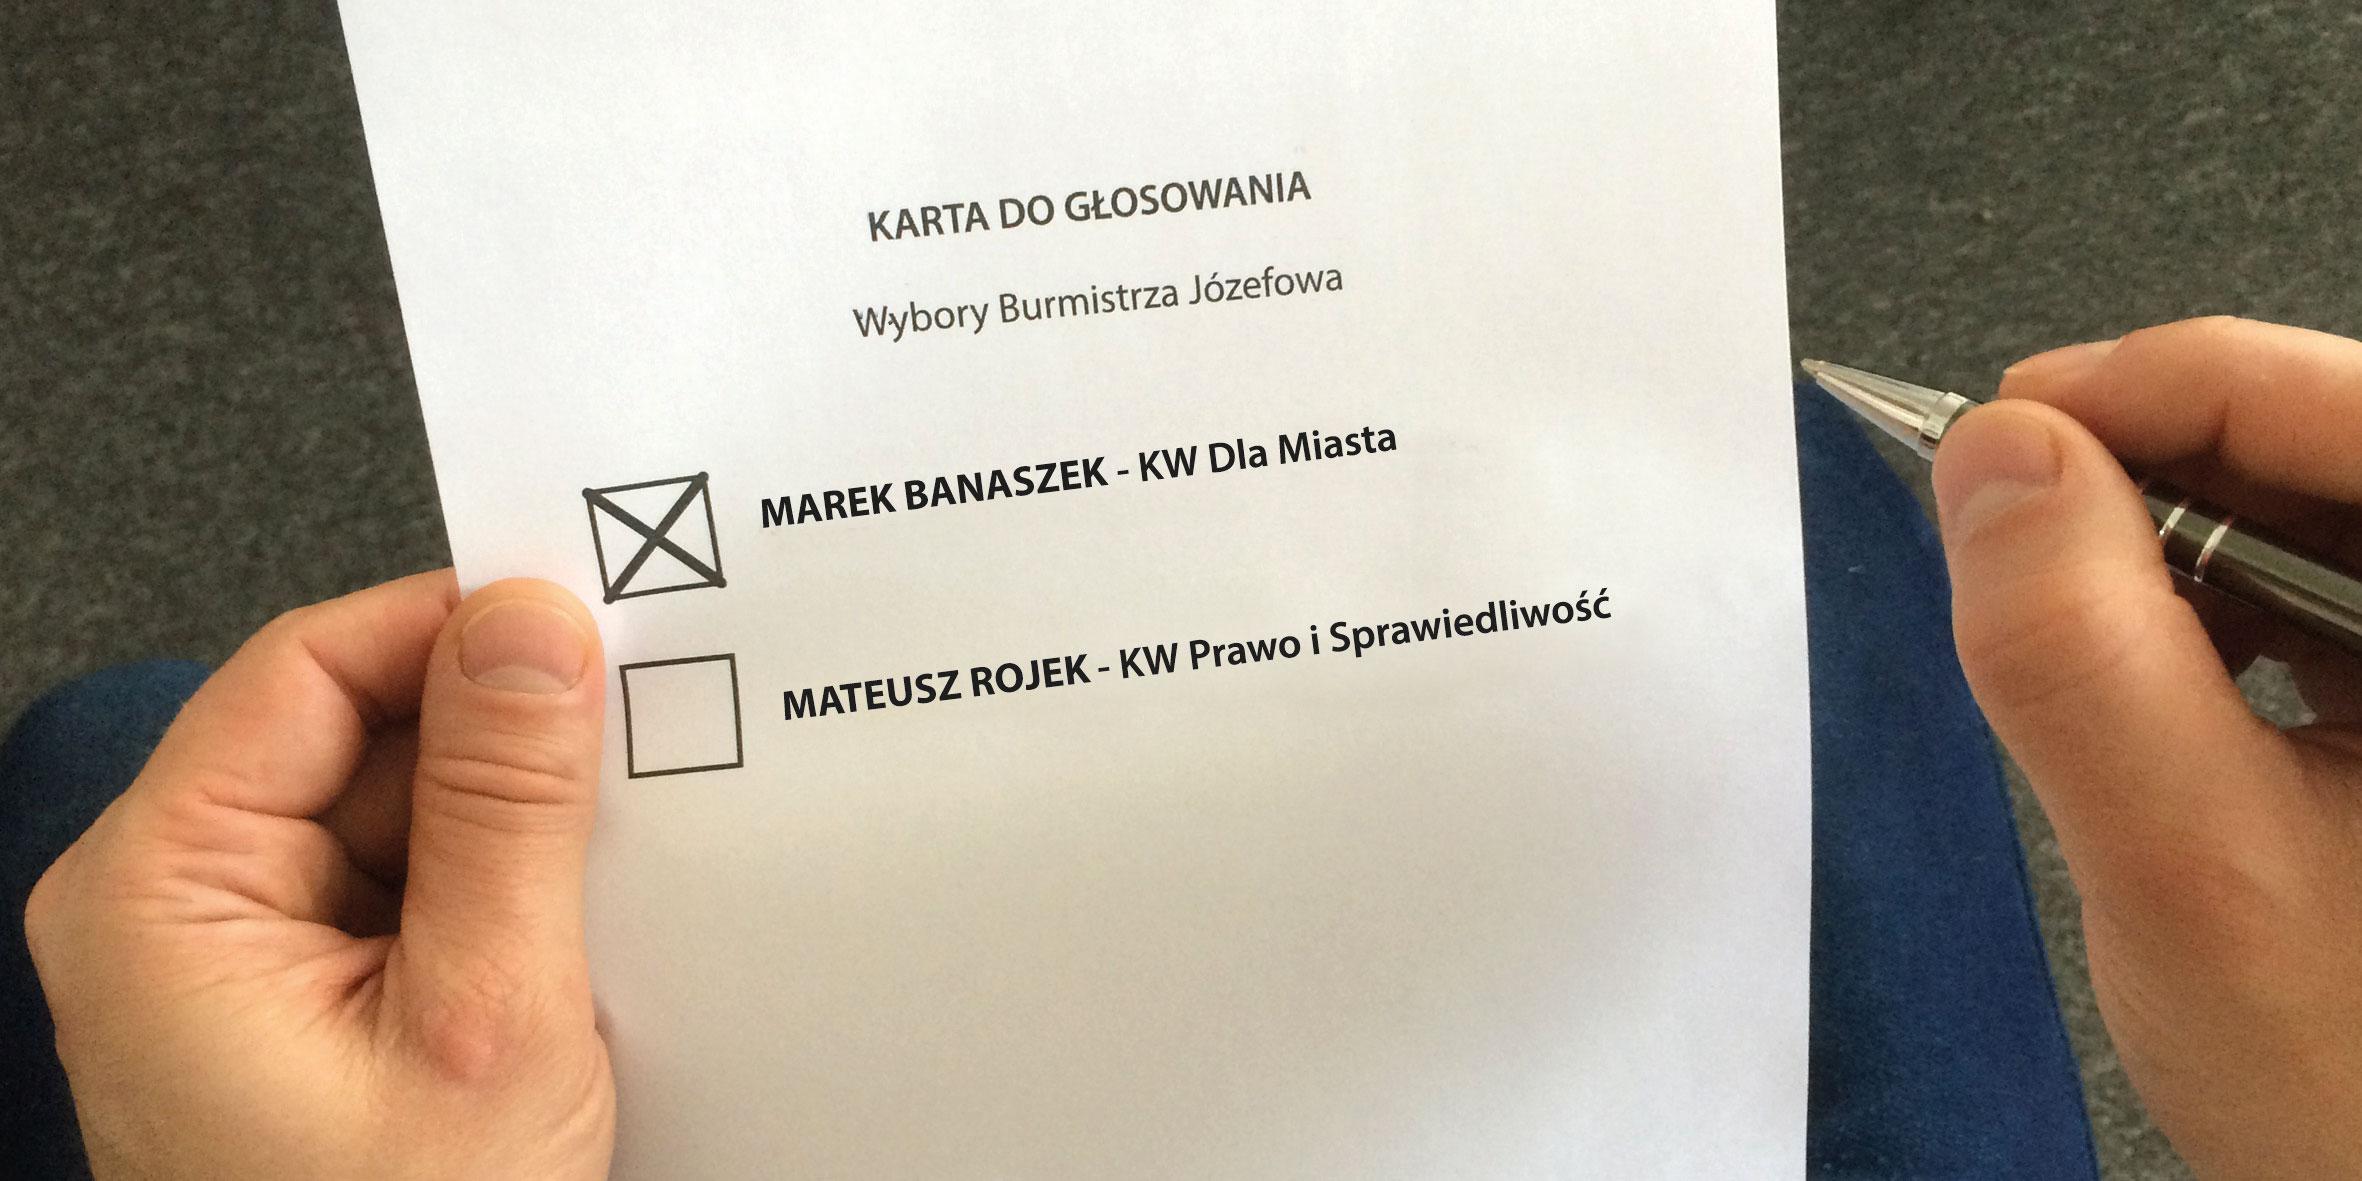 http://marekbanaszek.pl/wp-content/uploads/2018/10/jak_glosowac_2018.jpg